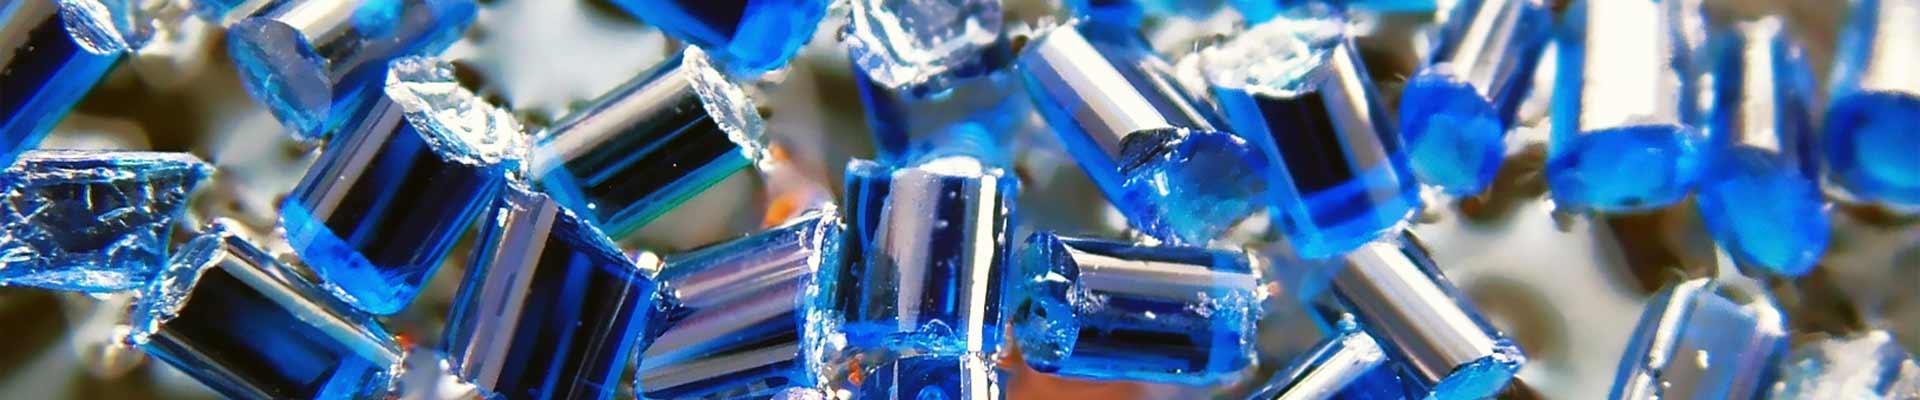 polymer_granules_blue